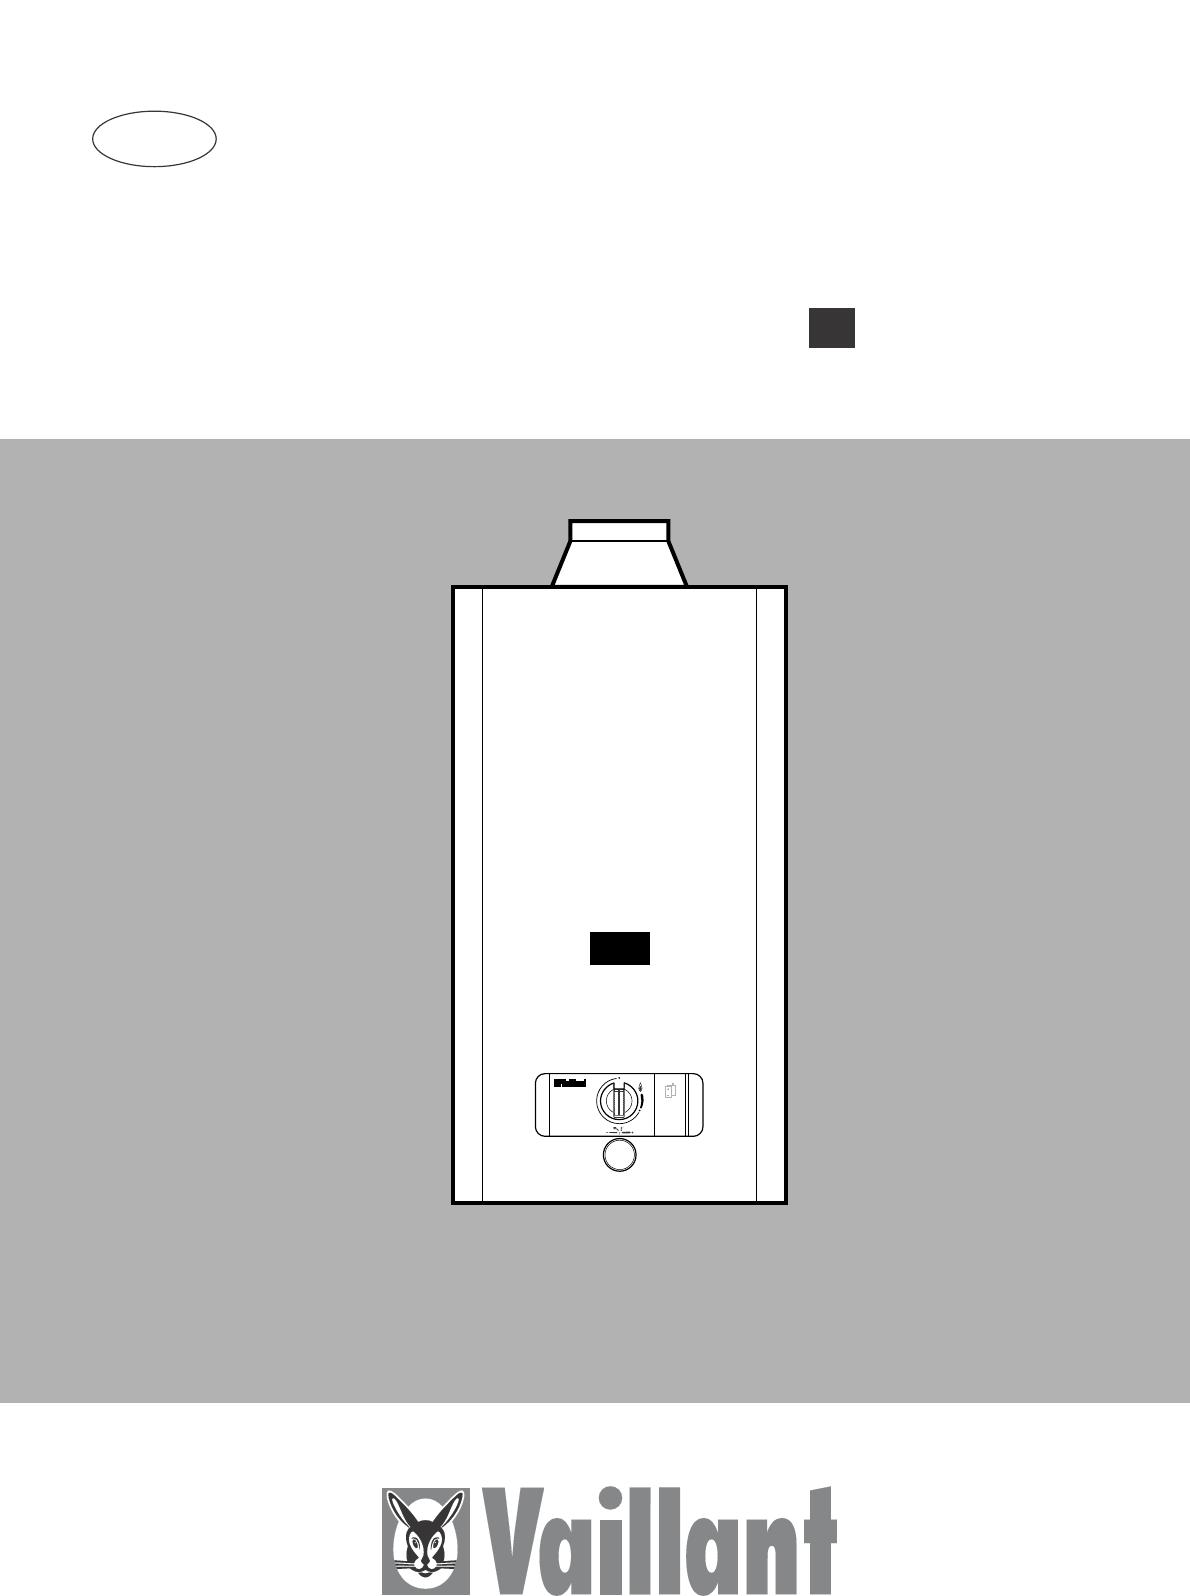 handleiding vaillant mag premium nl 19 2 xi pagina 1 van. Black Bedroom Furniture Sets. Home Design Ideas